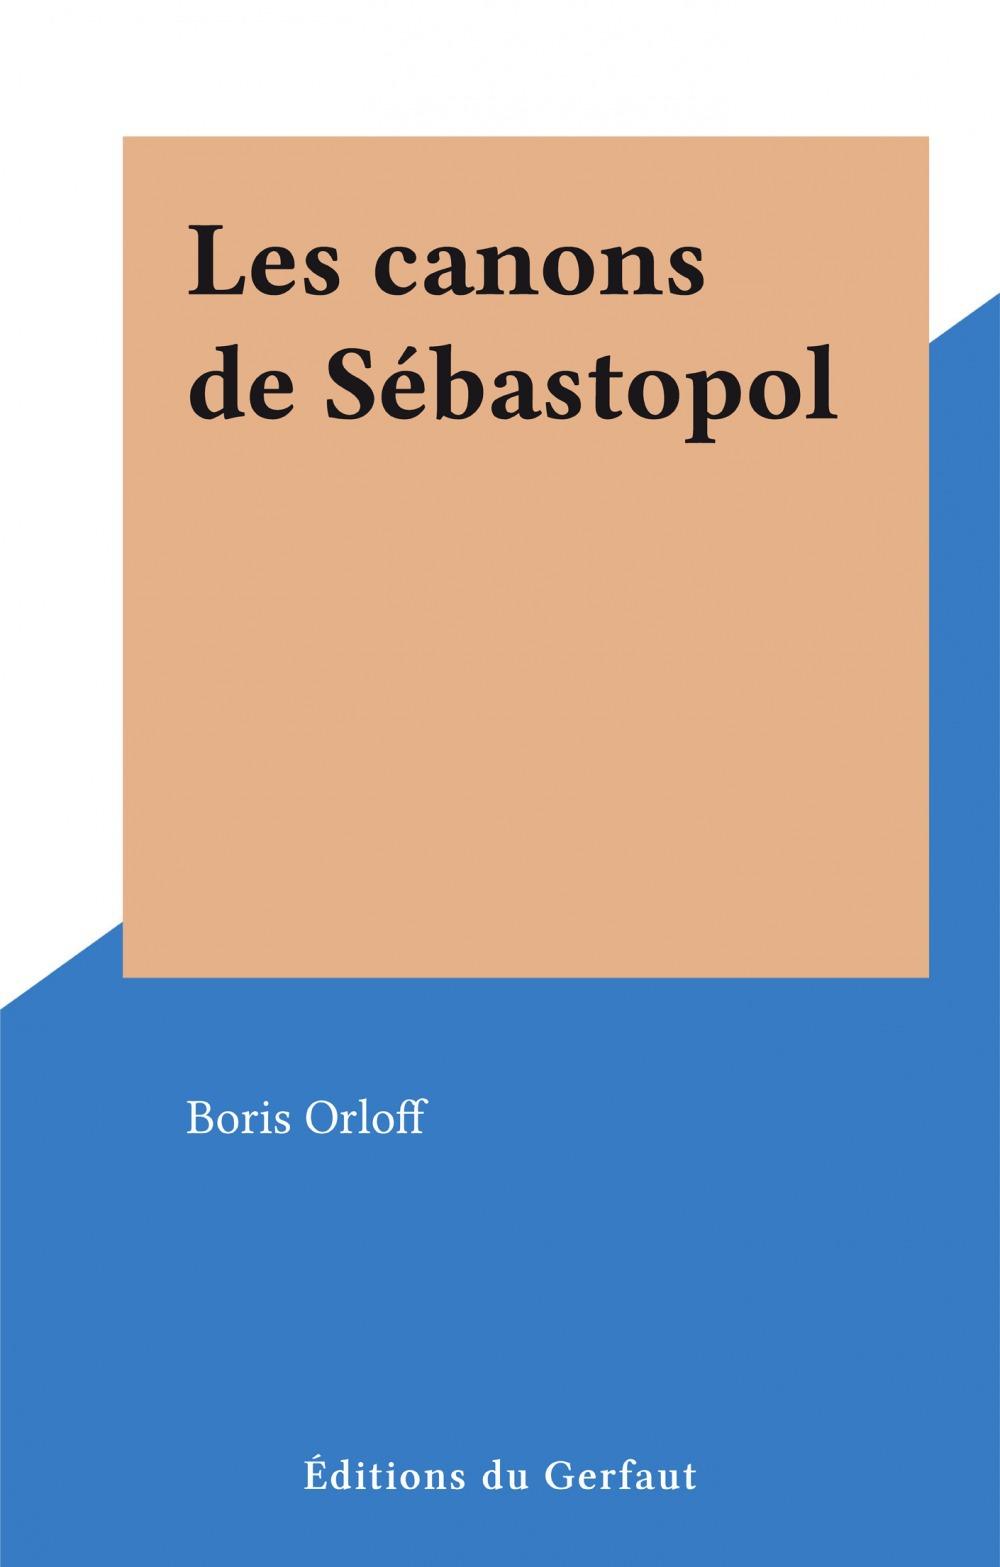 Les canons de Sébastopol